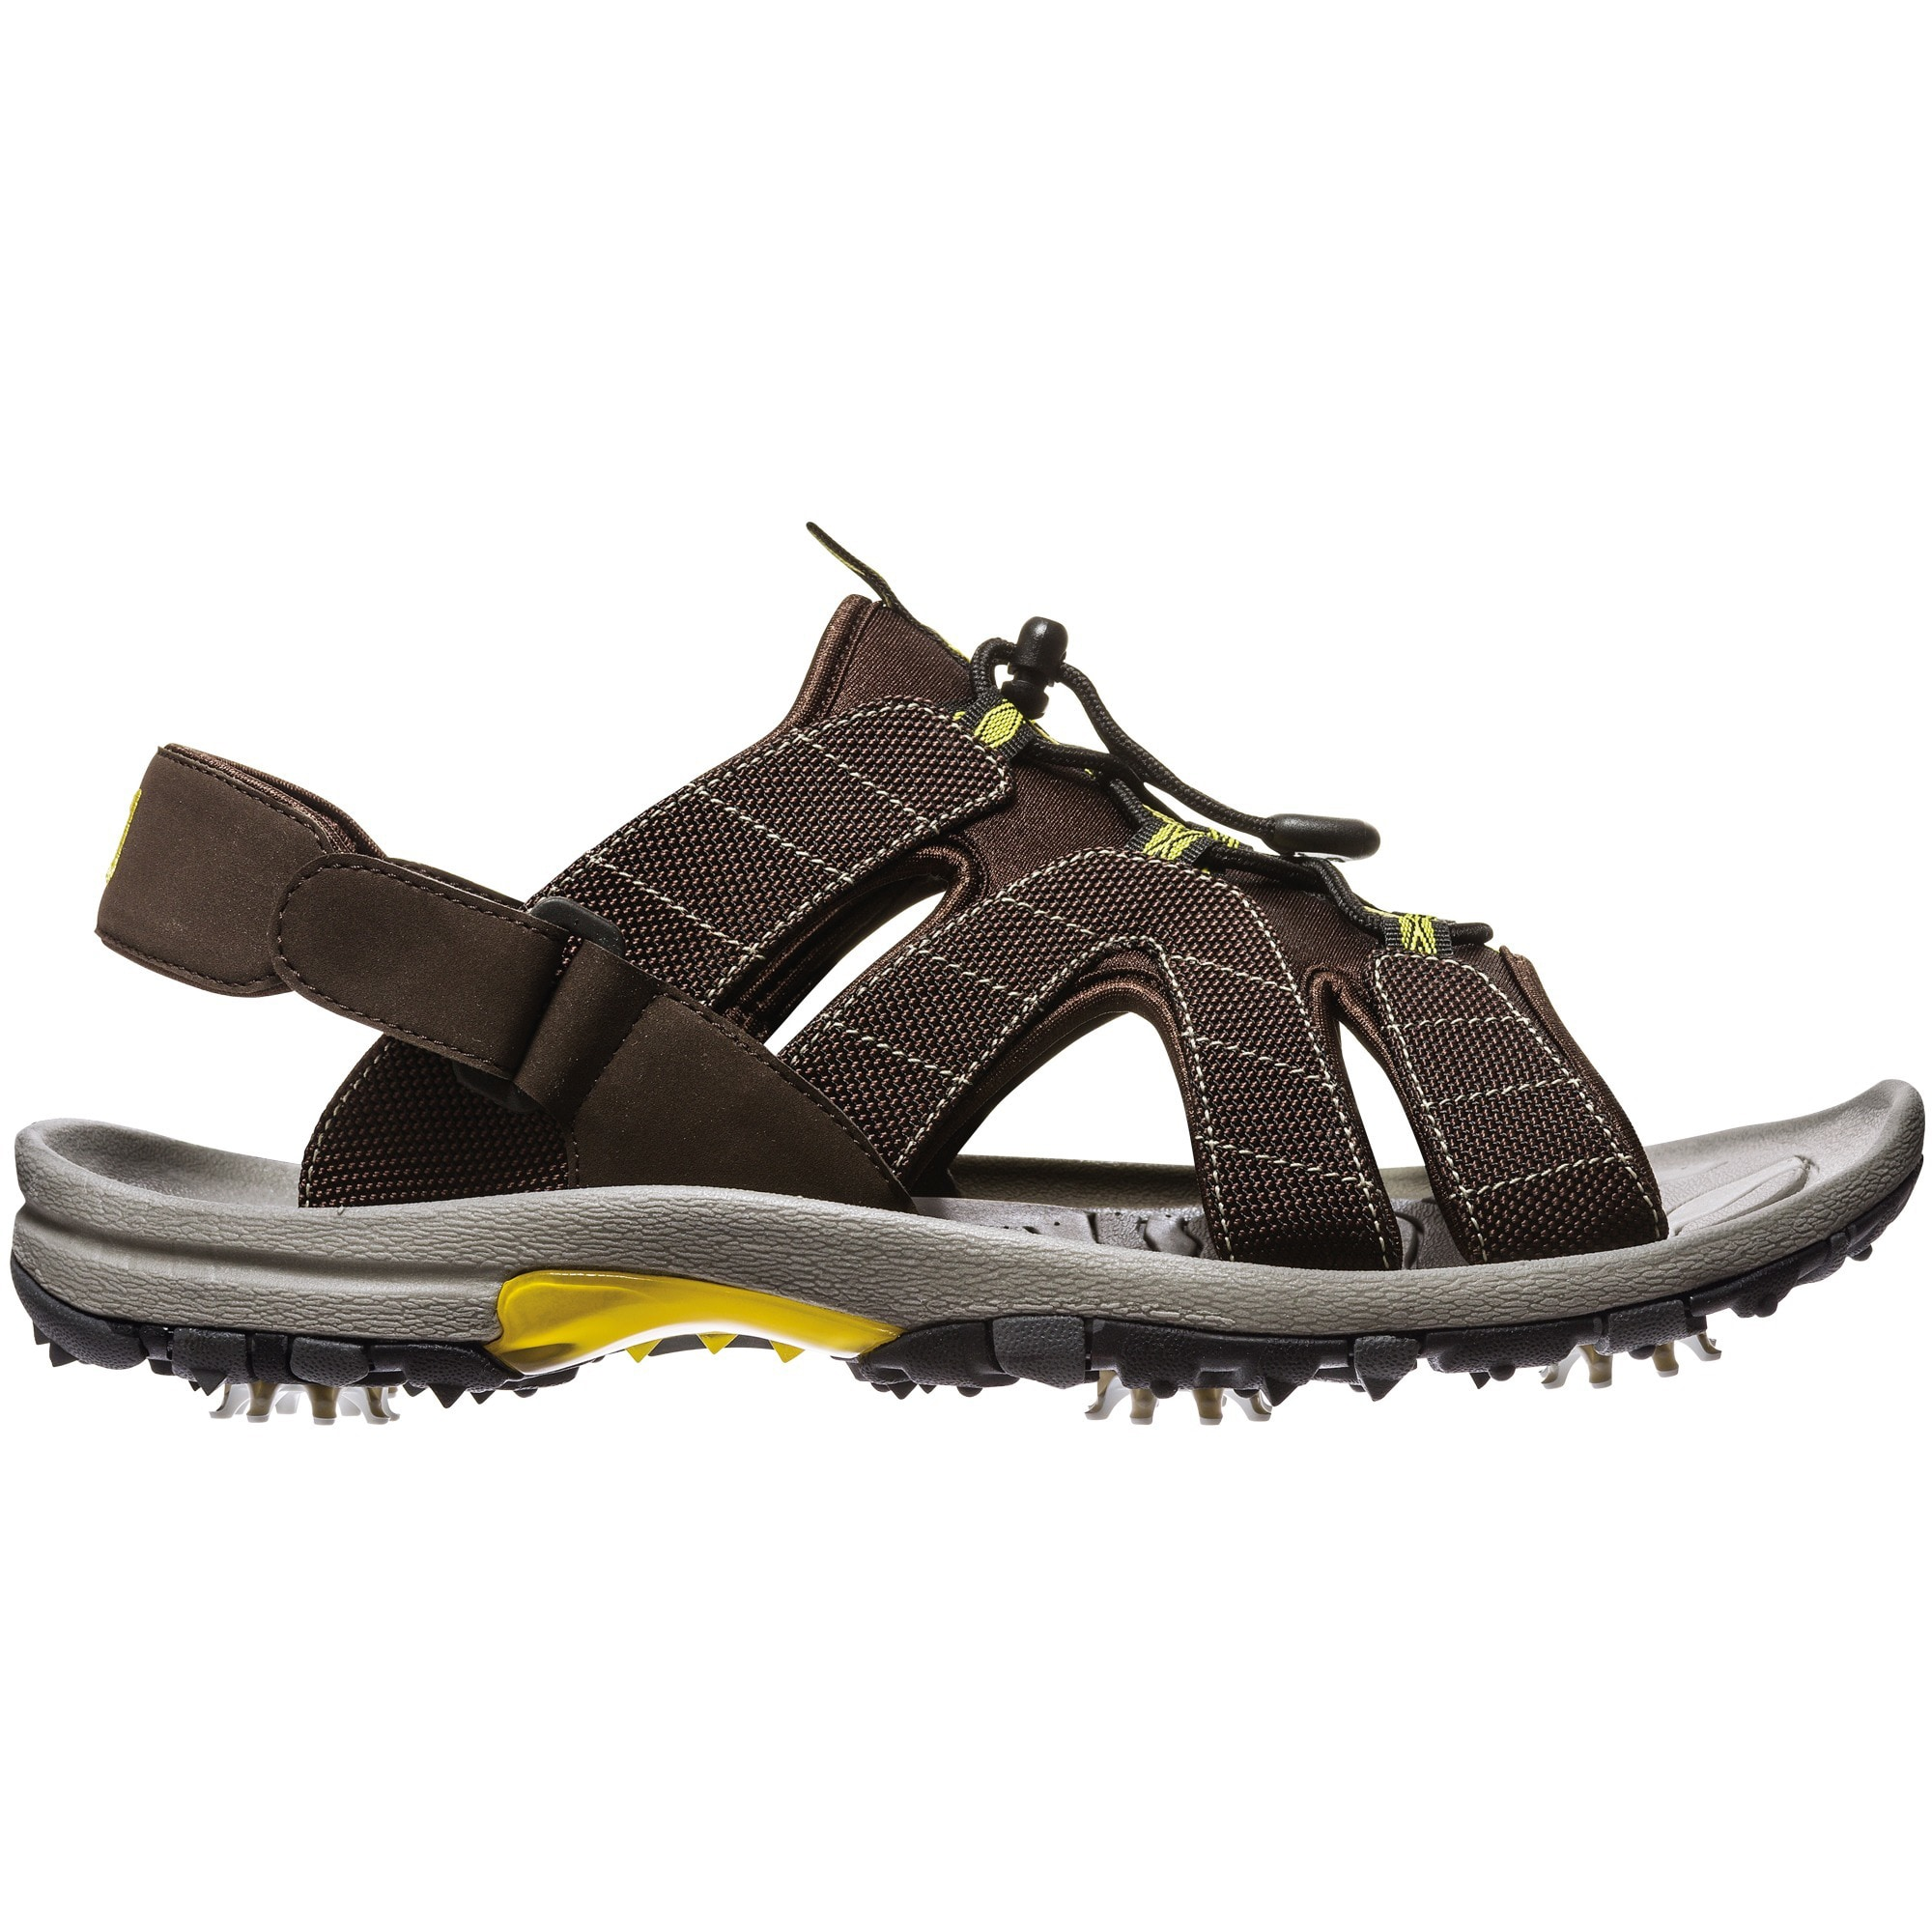 FootJoy Men's GreenJoy Sandal Golf Shoes at Sears.com